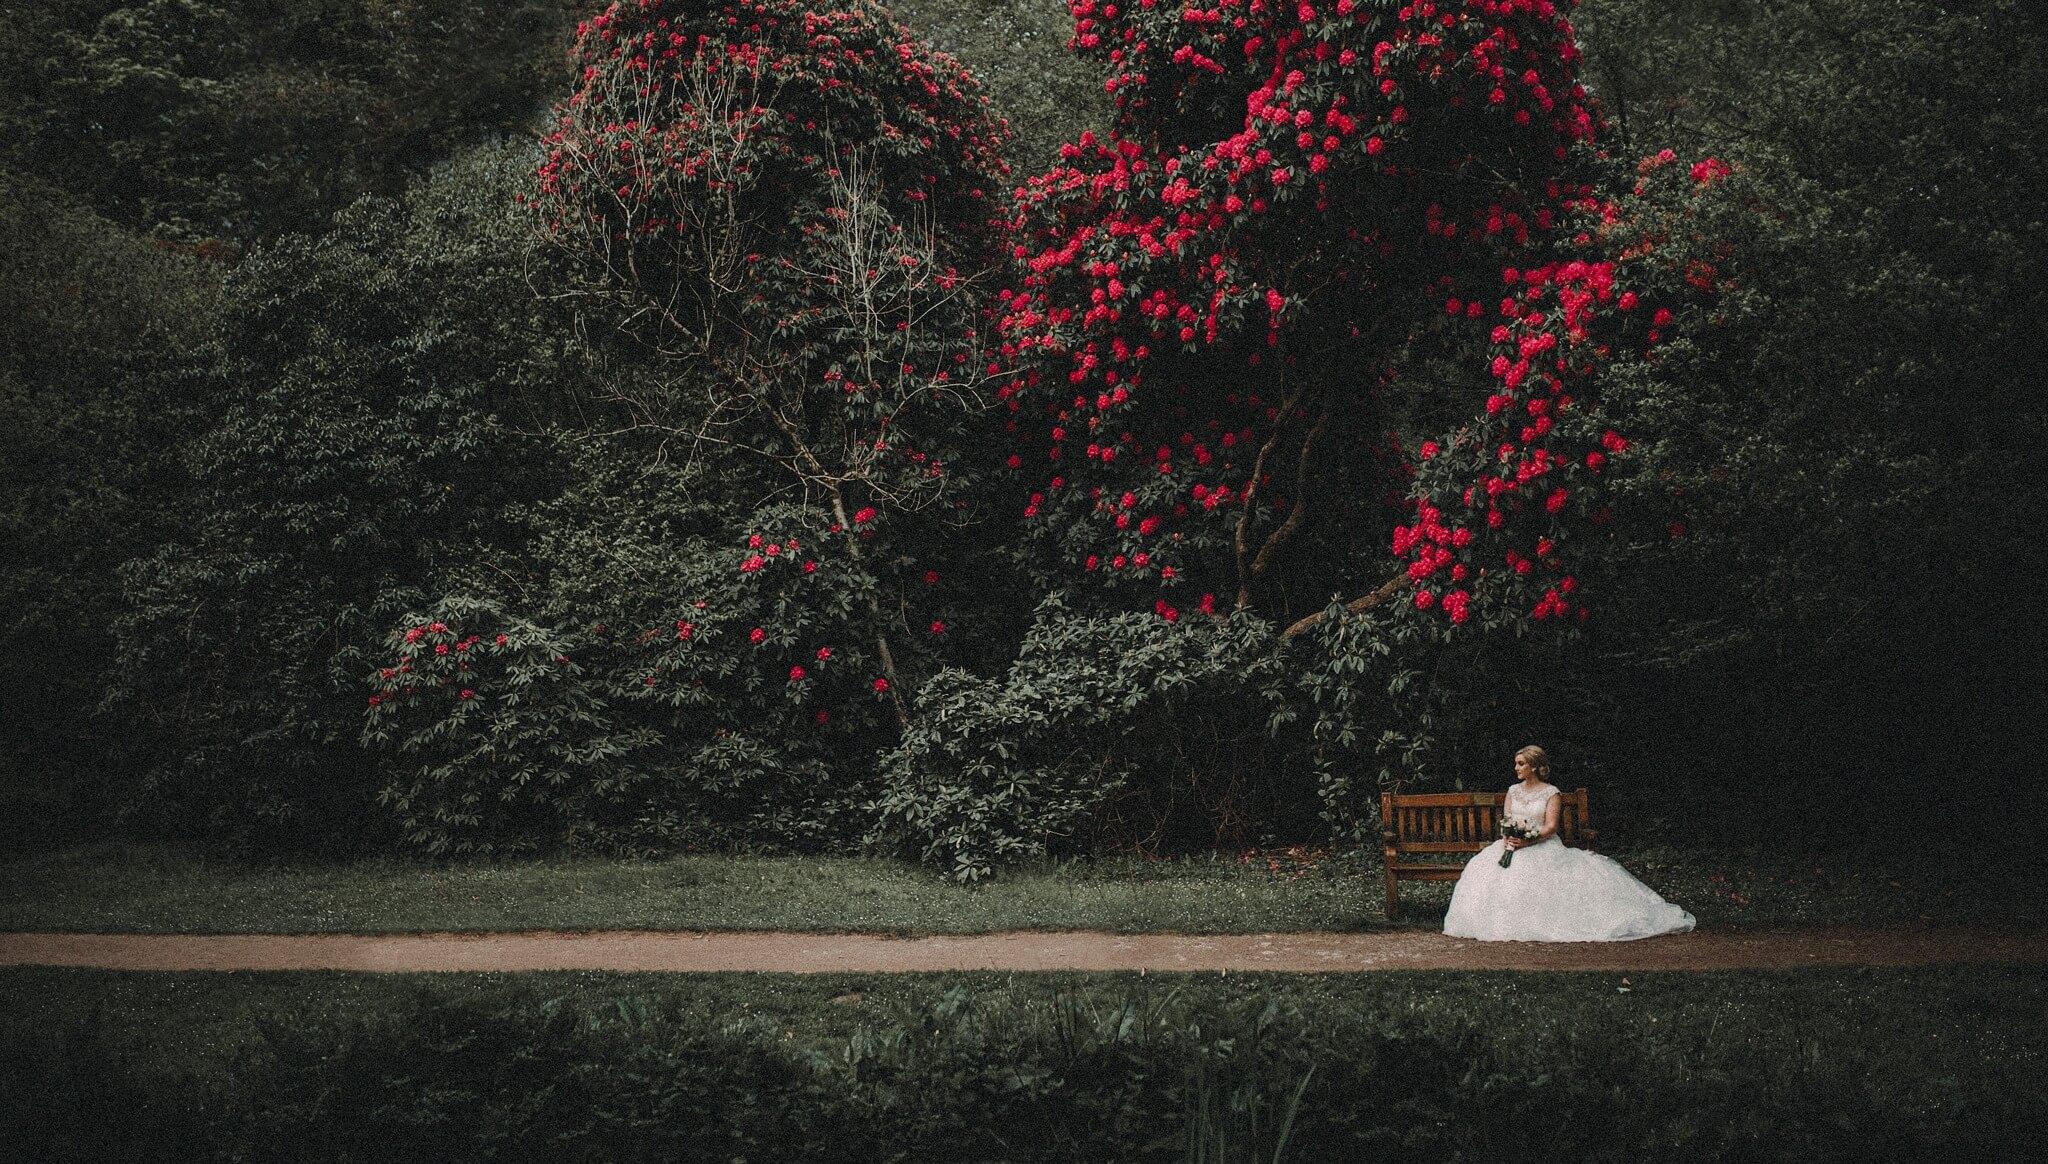 wedding-photographer-and-videographer-bryngarw-house-brynmenyn-bridgend-uk-02